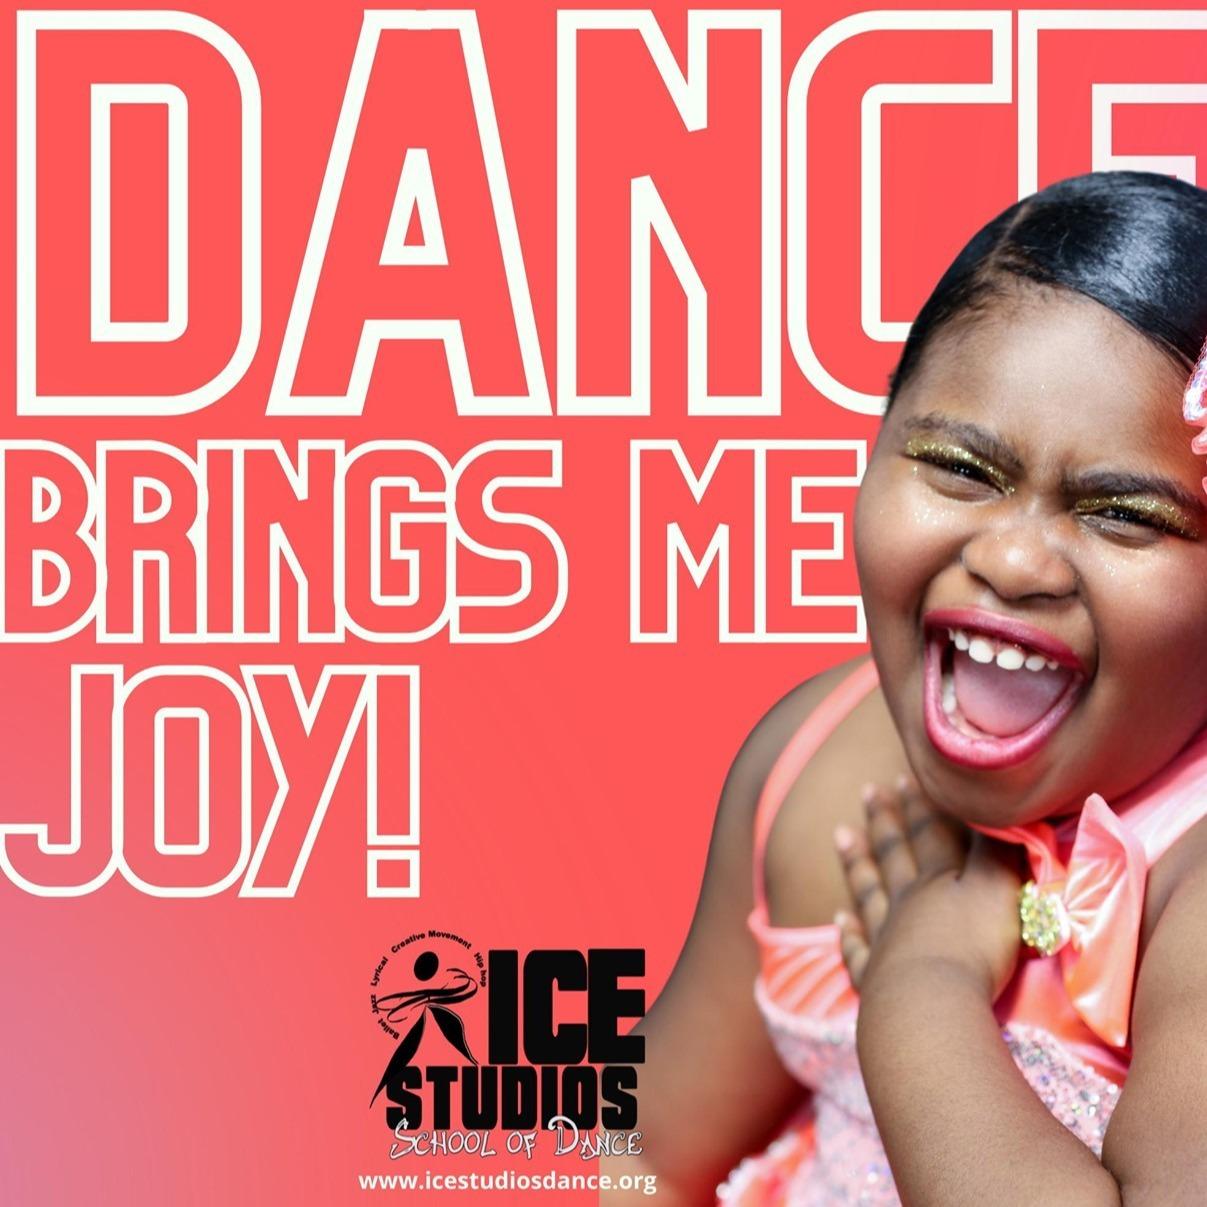 @Icestudiosdance SPONSORS A STUDENT OR PROGRAM  Link Thumbnail | Linktree